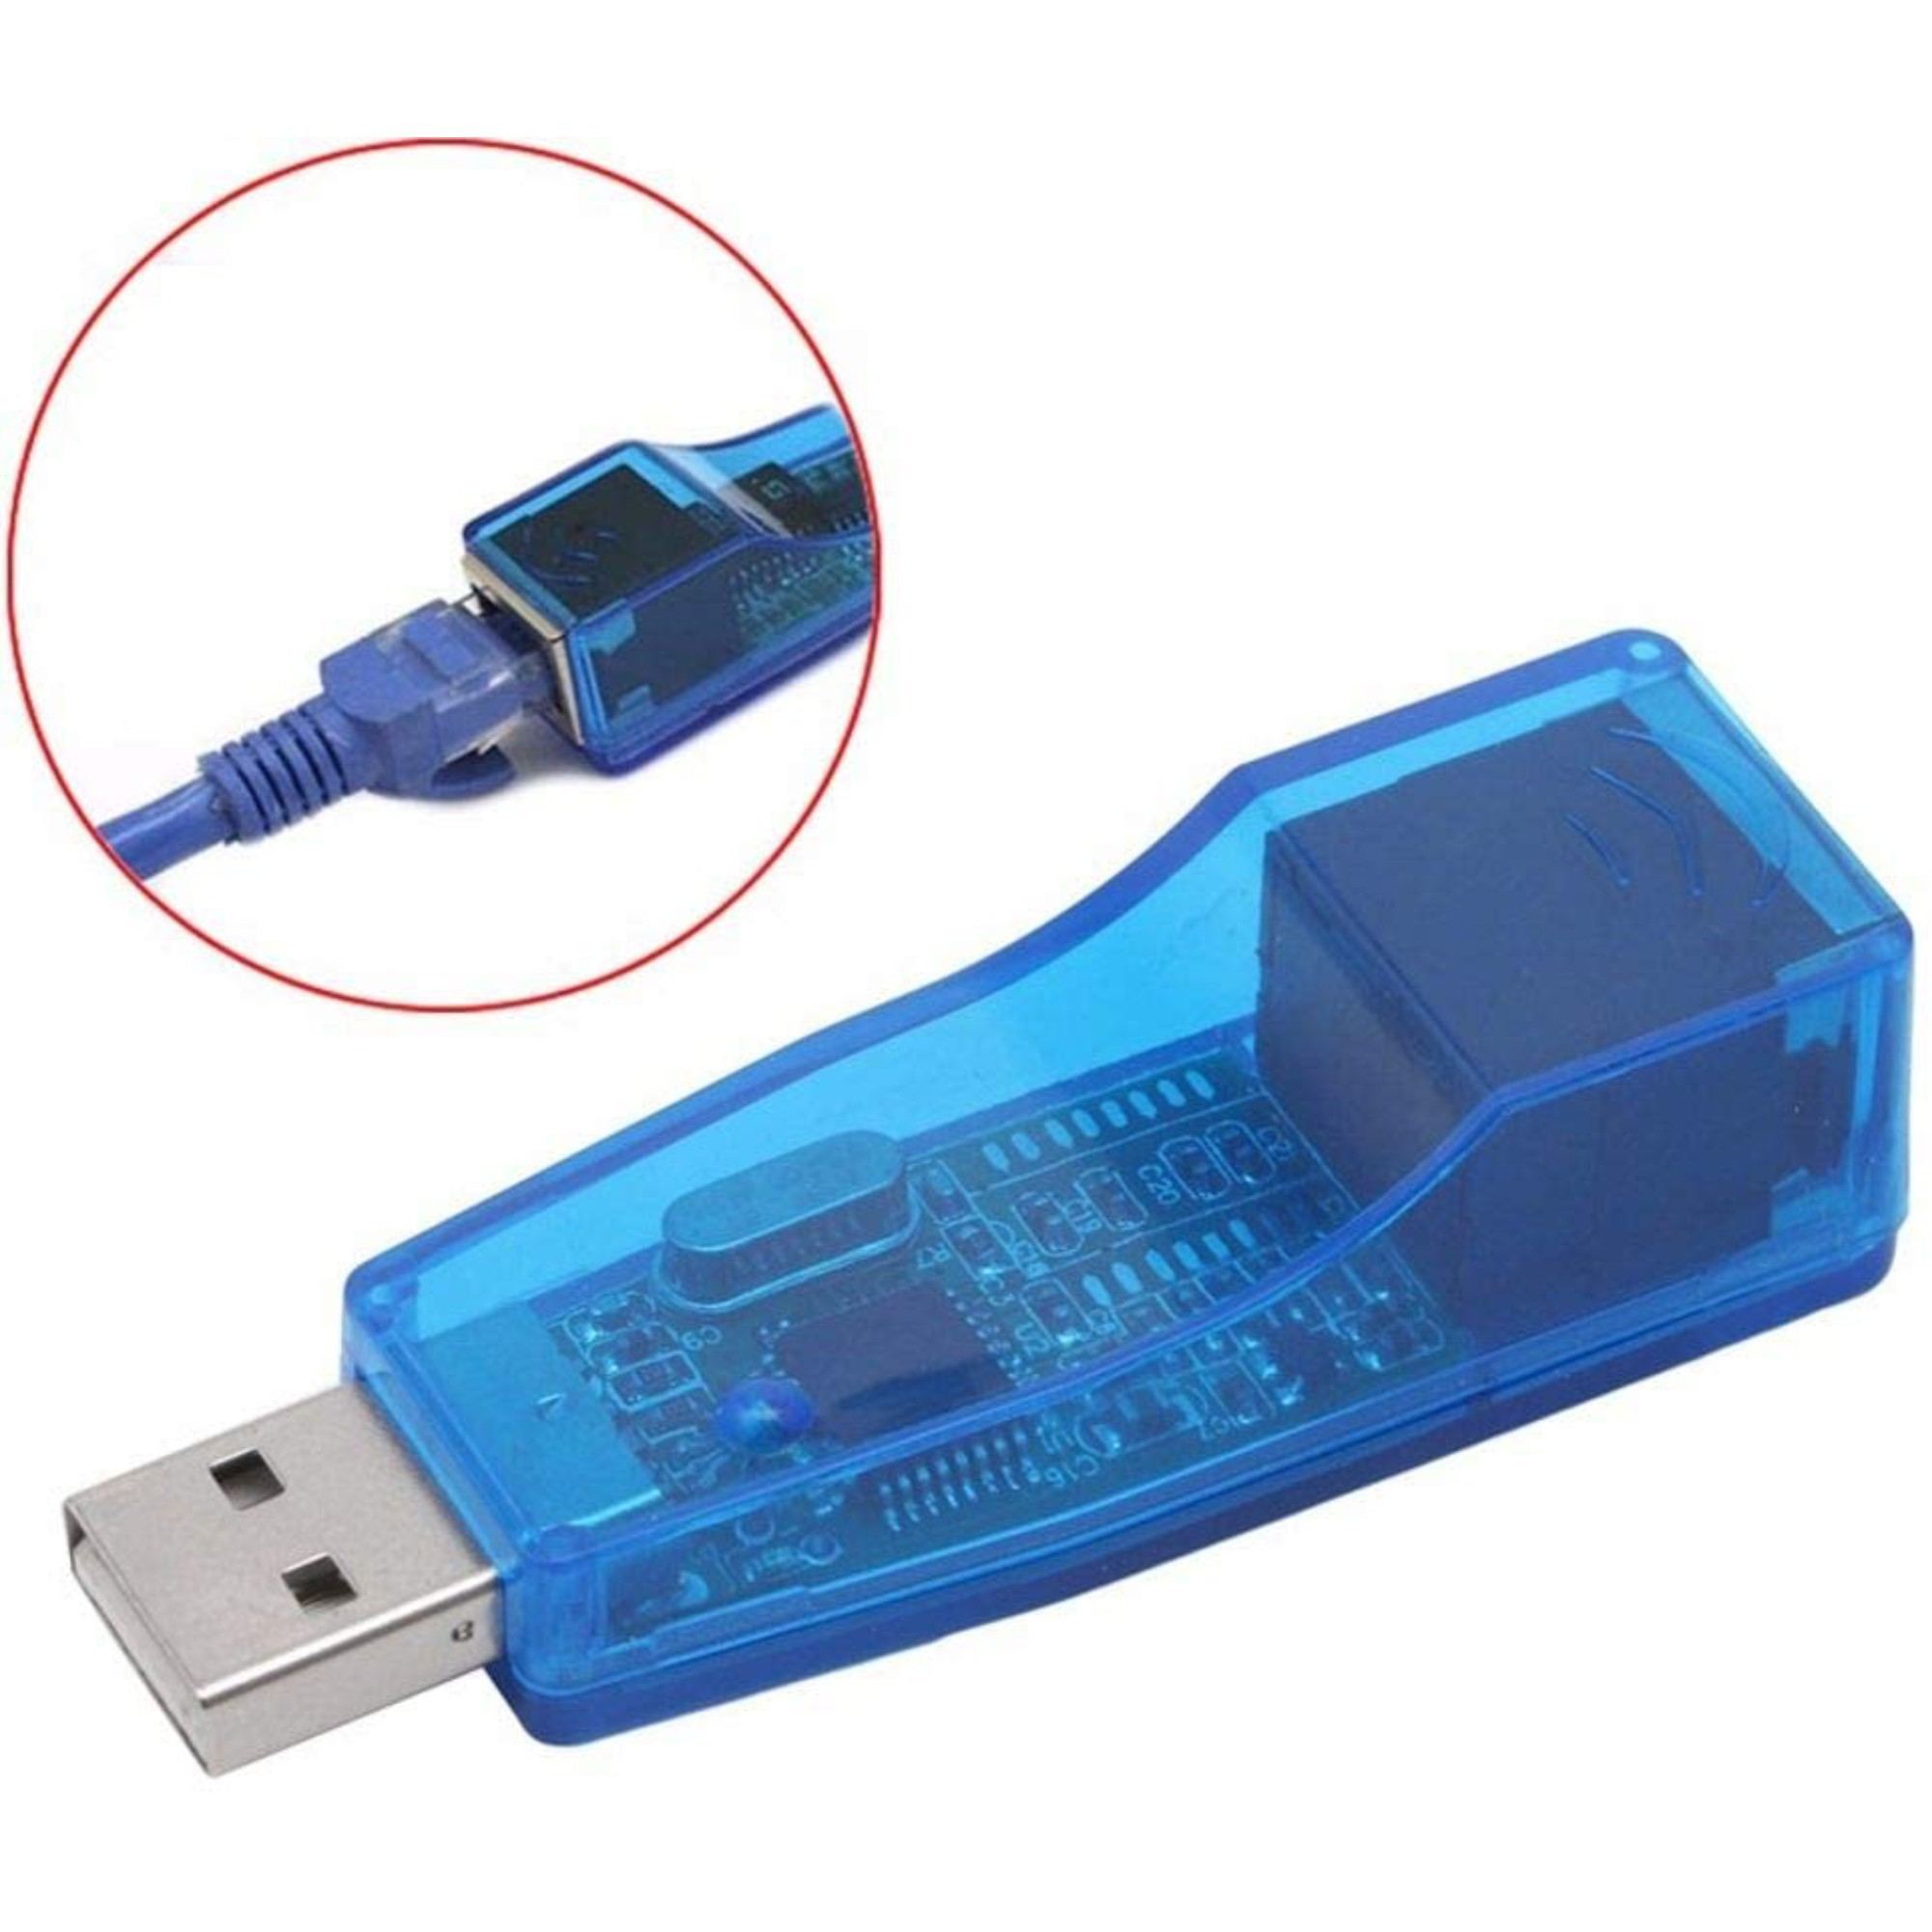 Adaptador De Rede USB Externa RJ45 Placa Lan Ethernet 10/100mbps